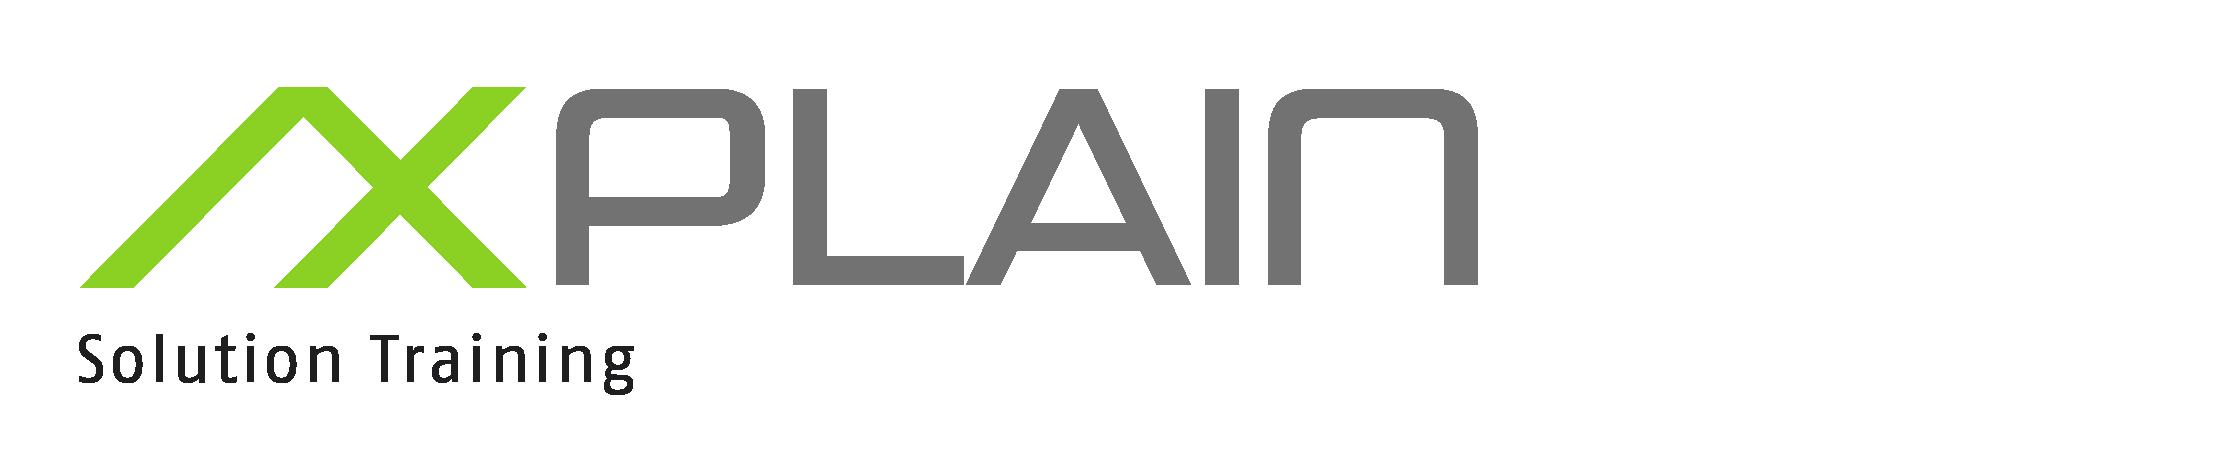 axplain_logo.png